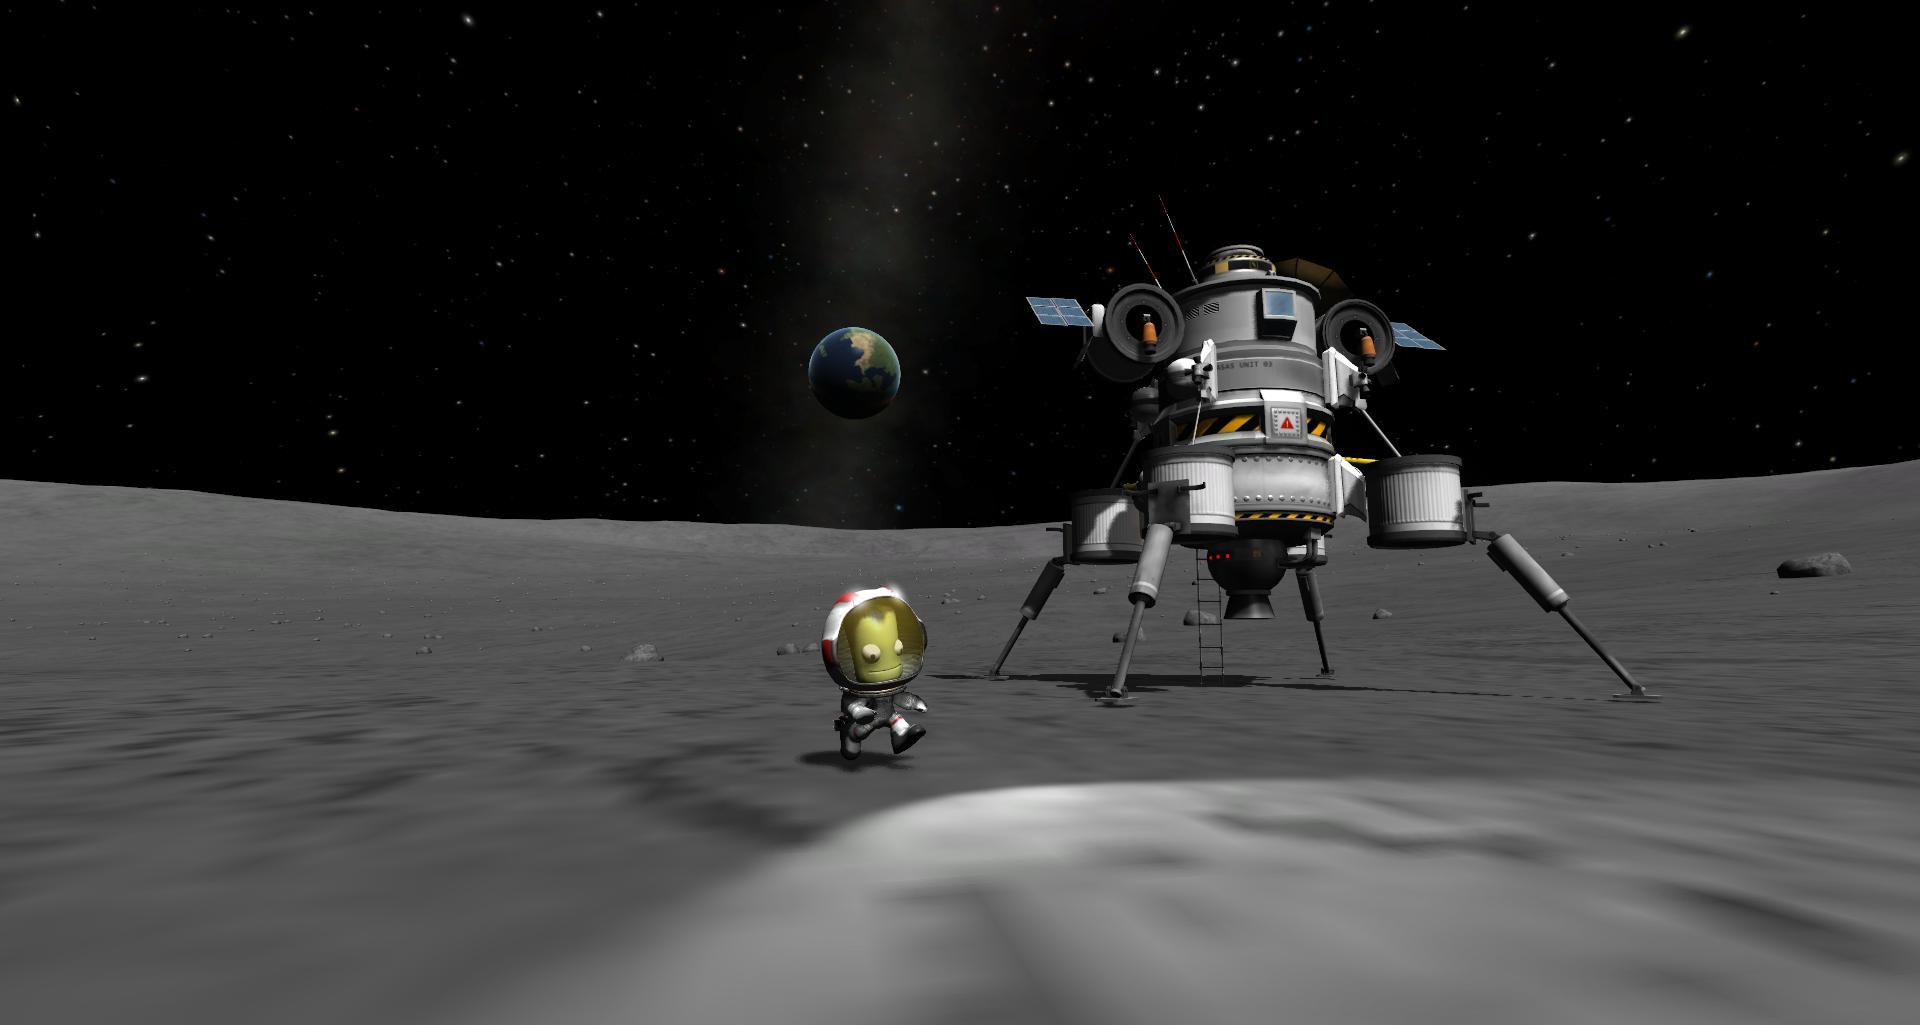 kerbal space program serious business - photo #29